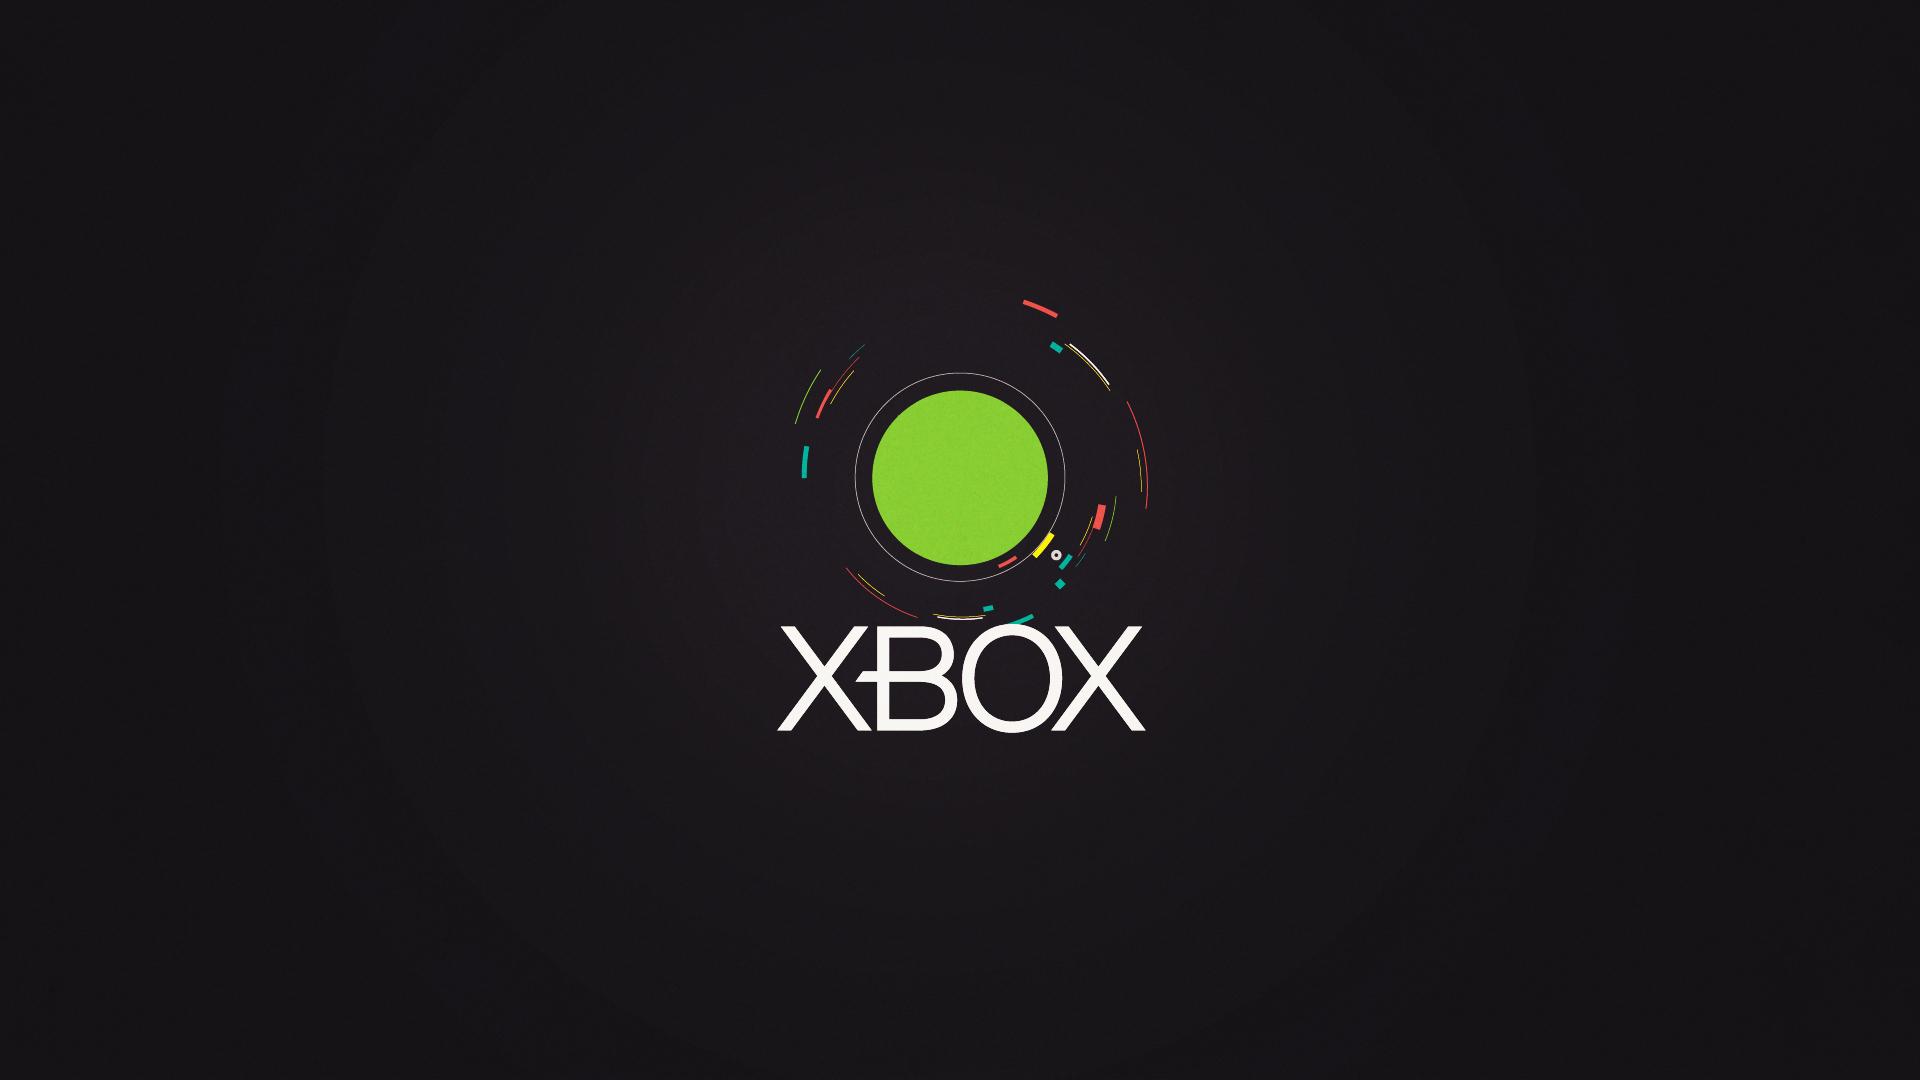 Buck - 2013 - Xbox Pitch Frame 18.jpg